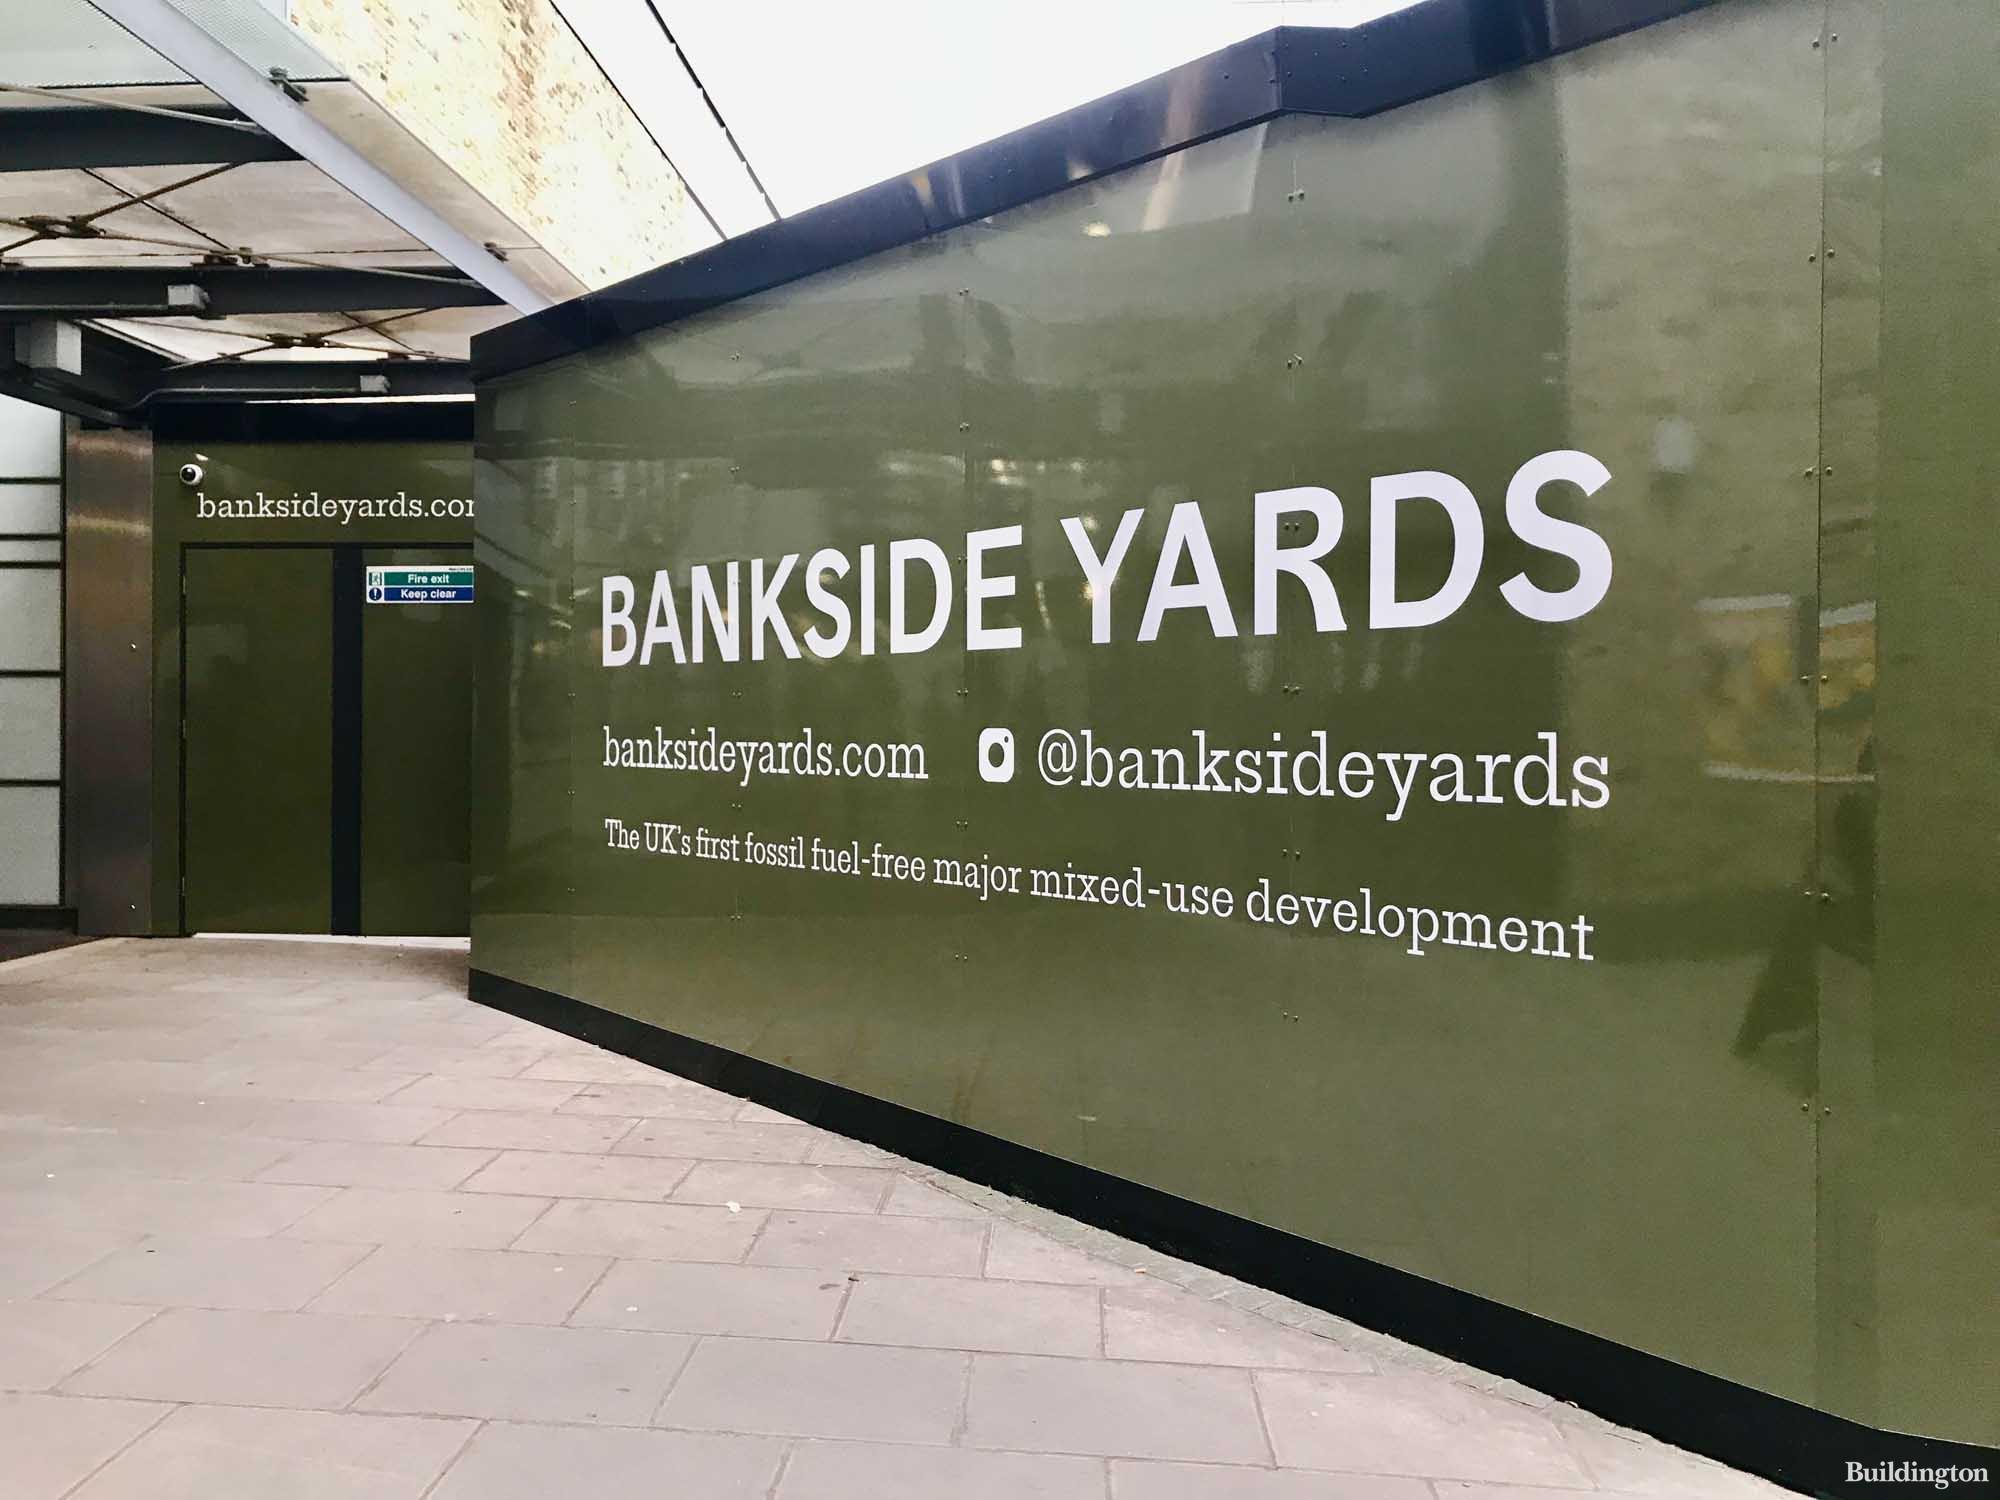 Bankside Yards hoarding in front of Blackfriars station south side.